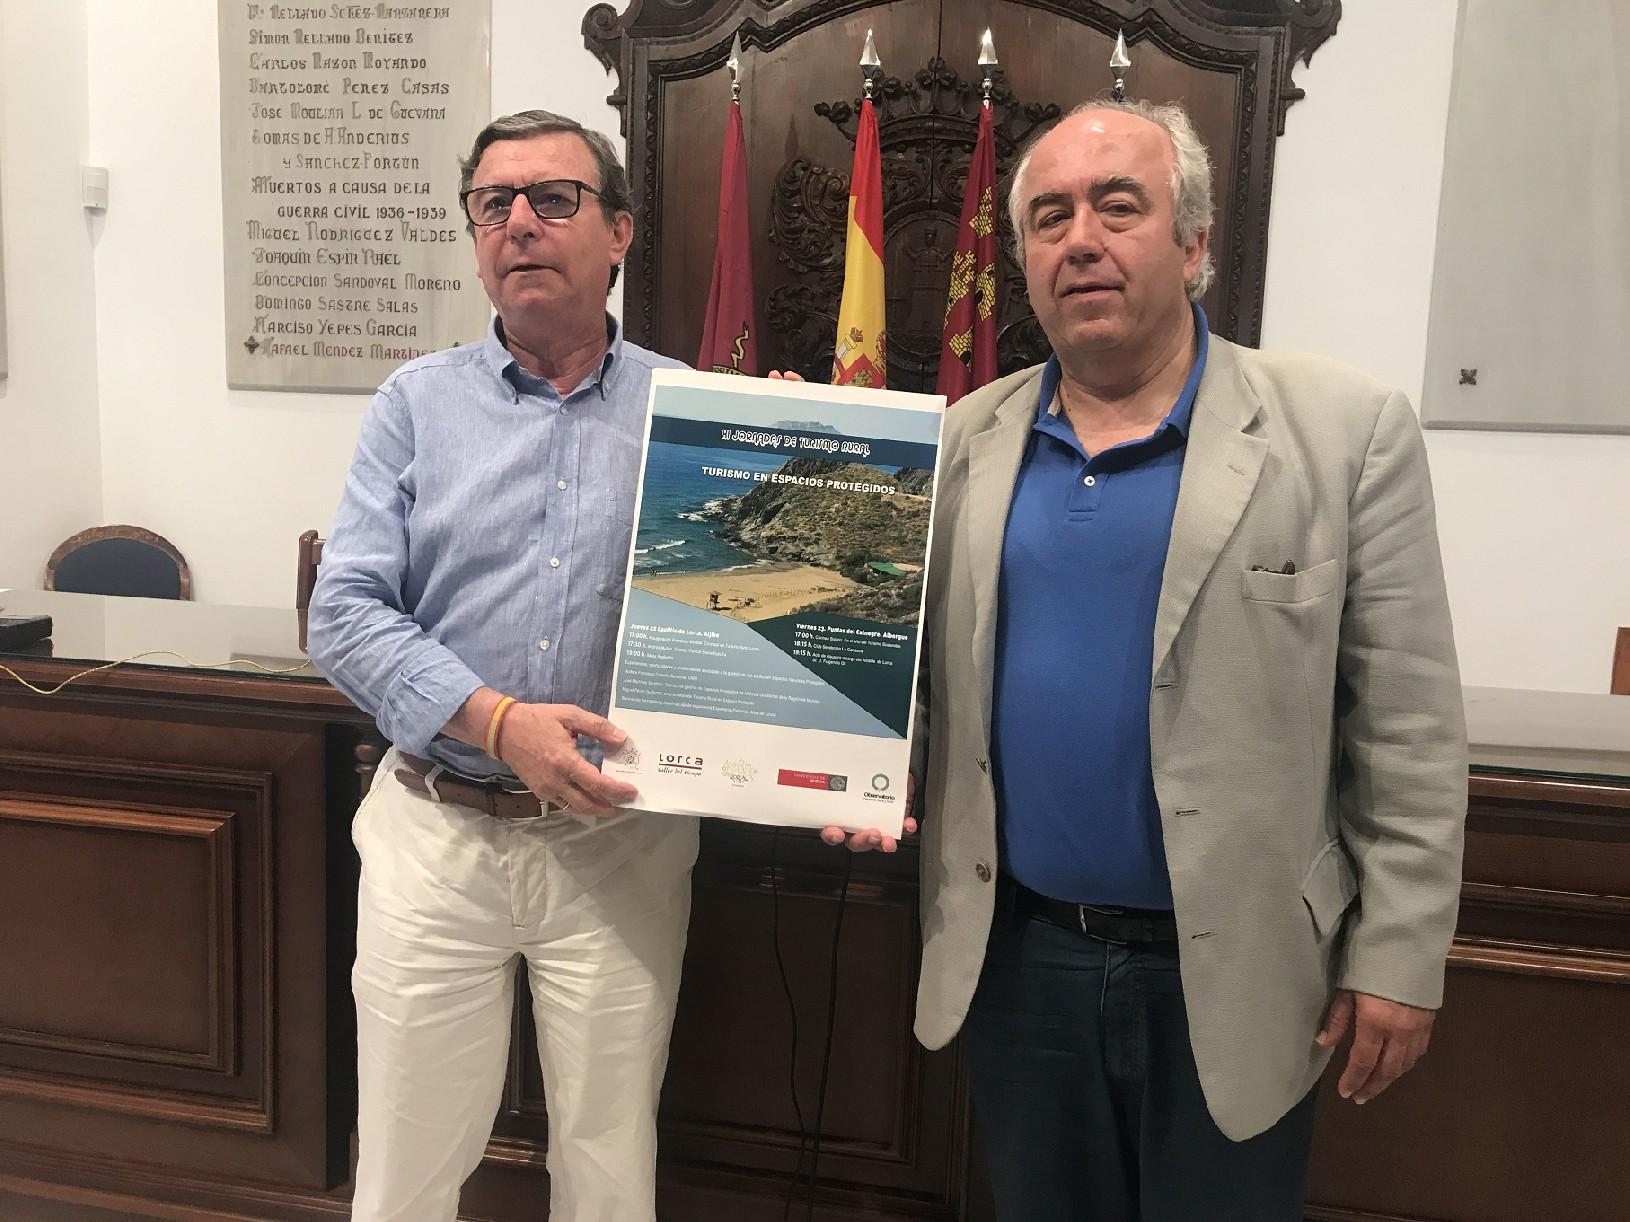 http://www.lorca.es/notasPrensaIMG/grandes/10404719062017630776.JPG